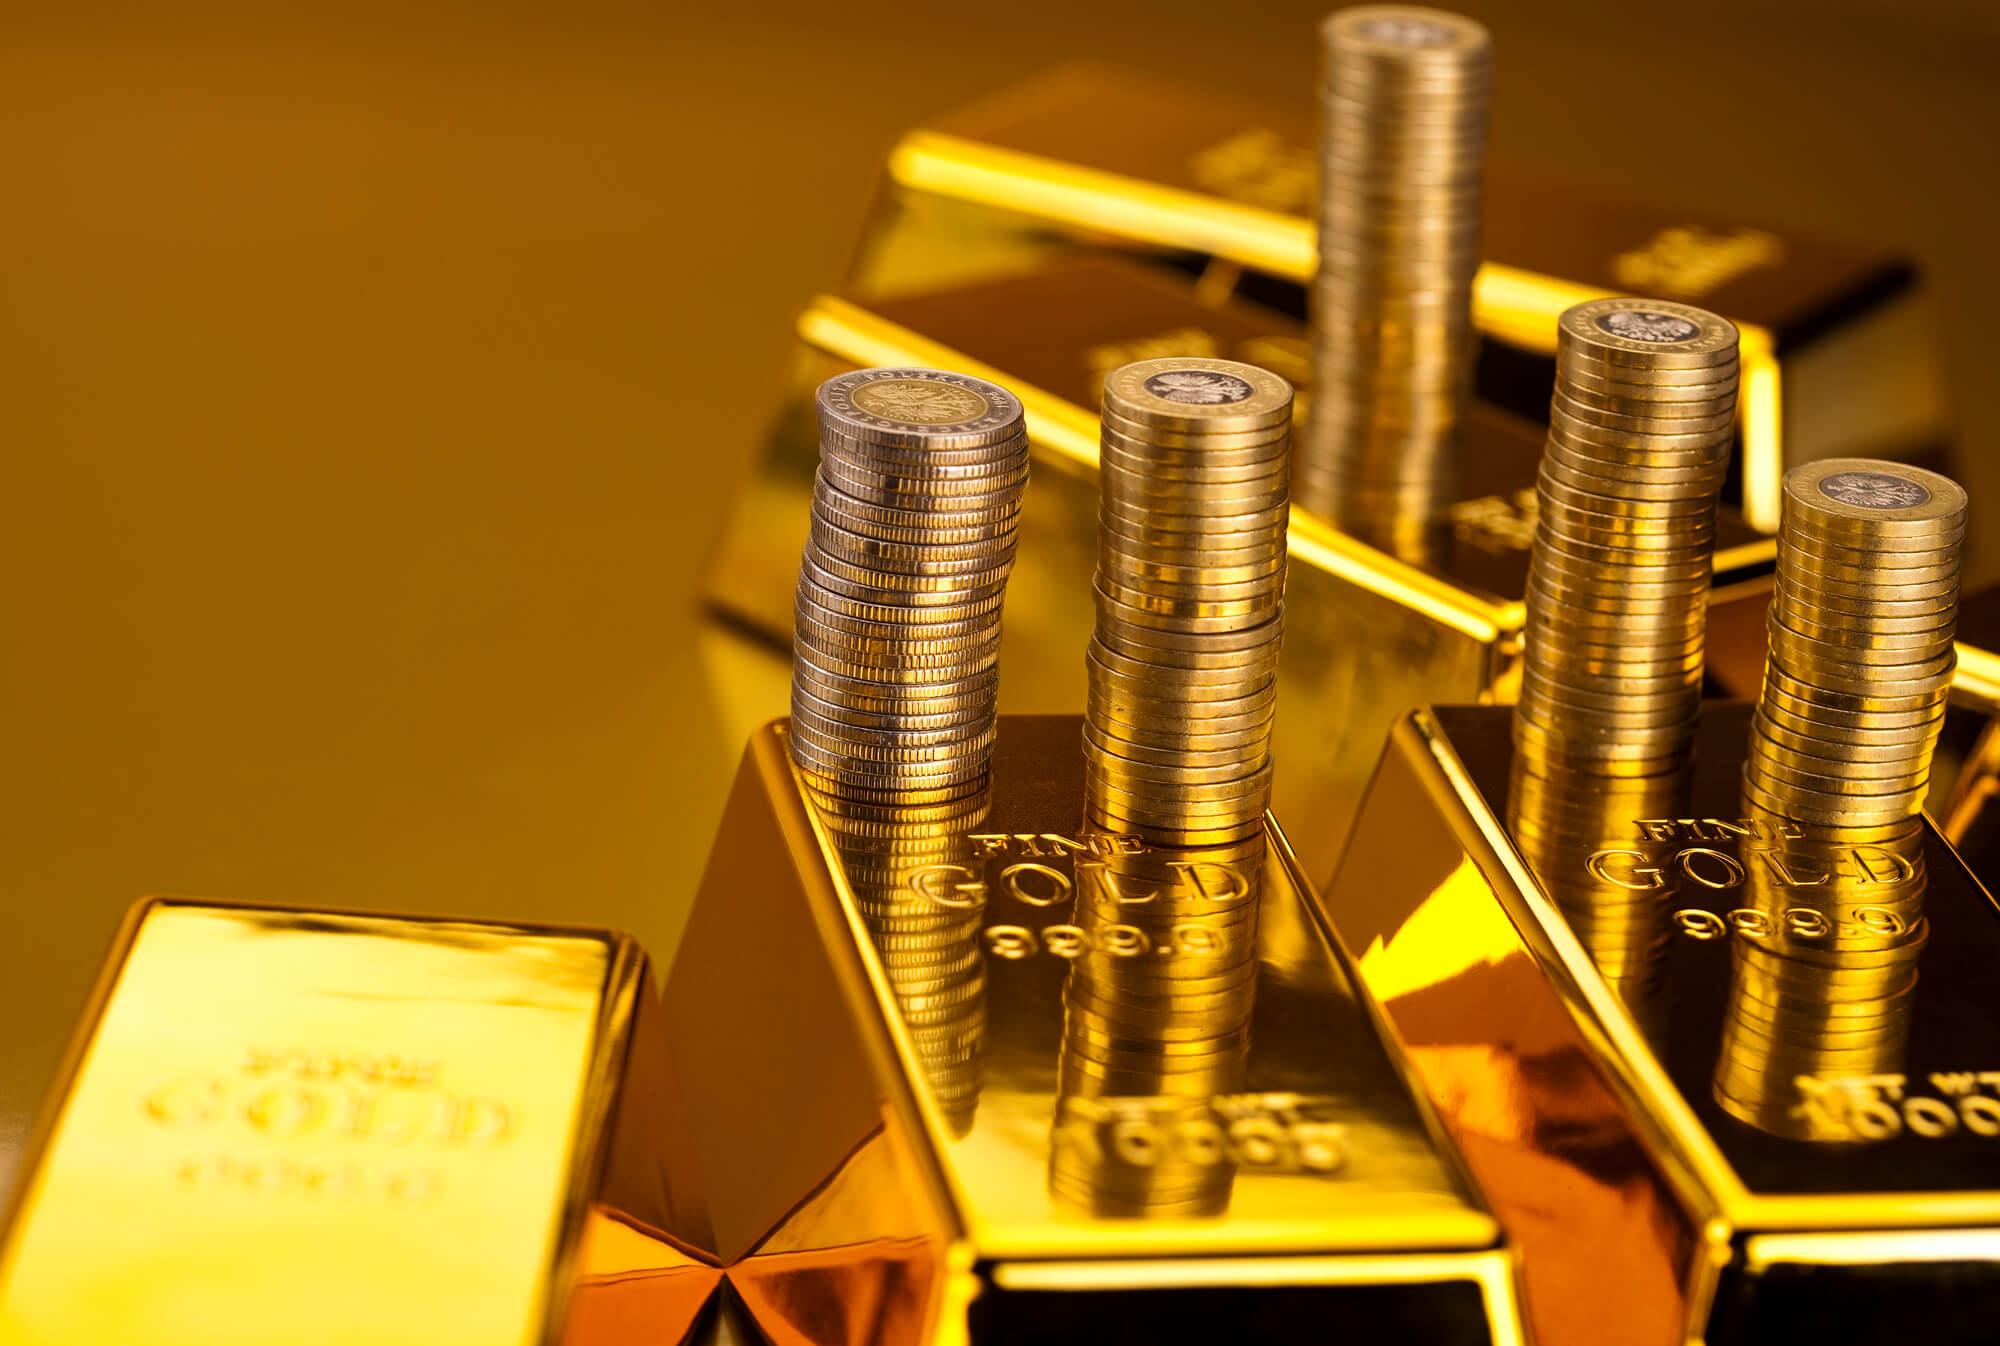 us-mint-gold-coins-west-palm-beach